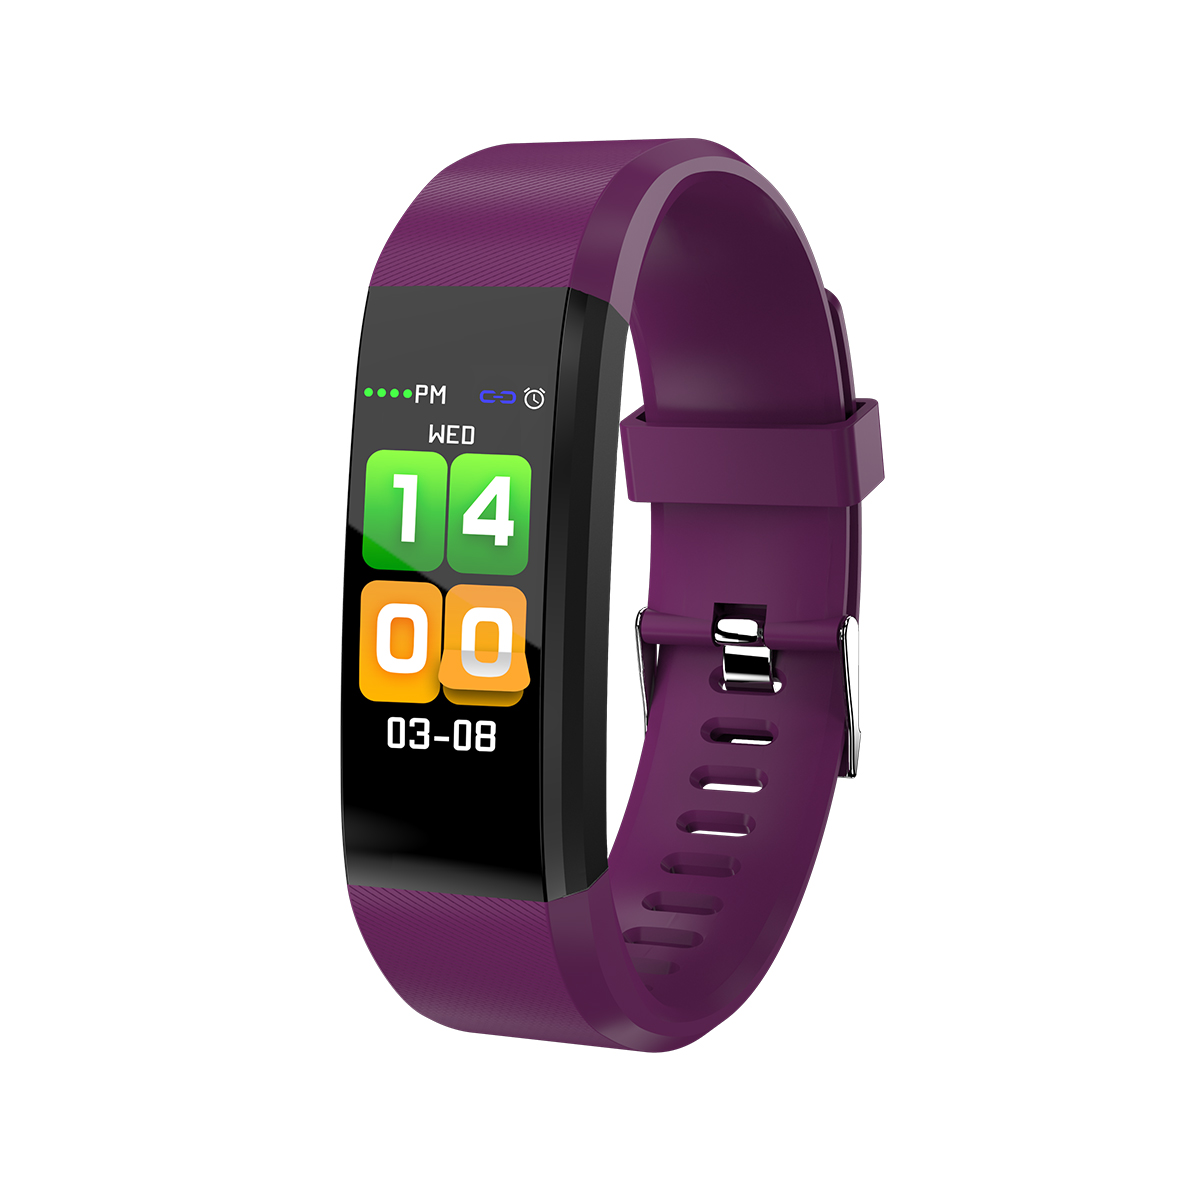 все цены на chkj Фиолетовый шарм Смарт-браслет онлайн